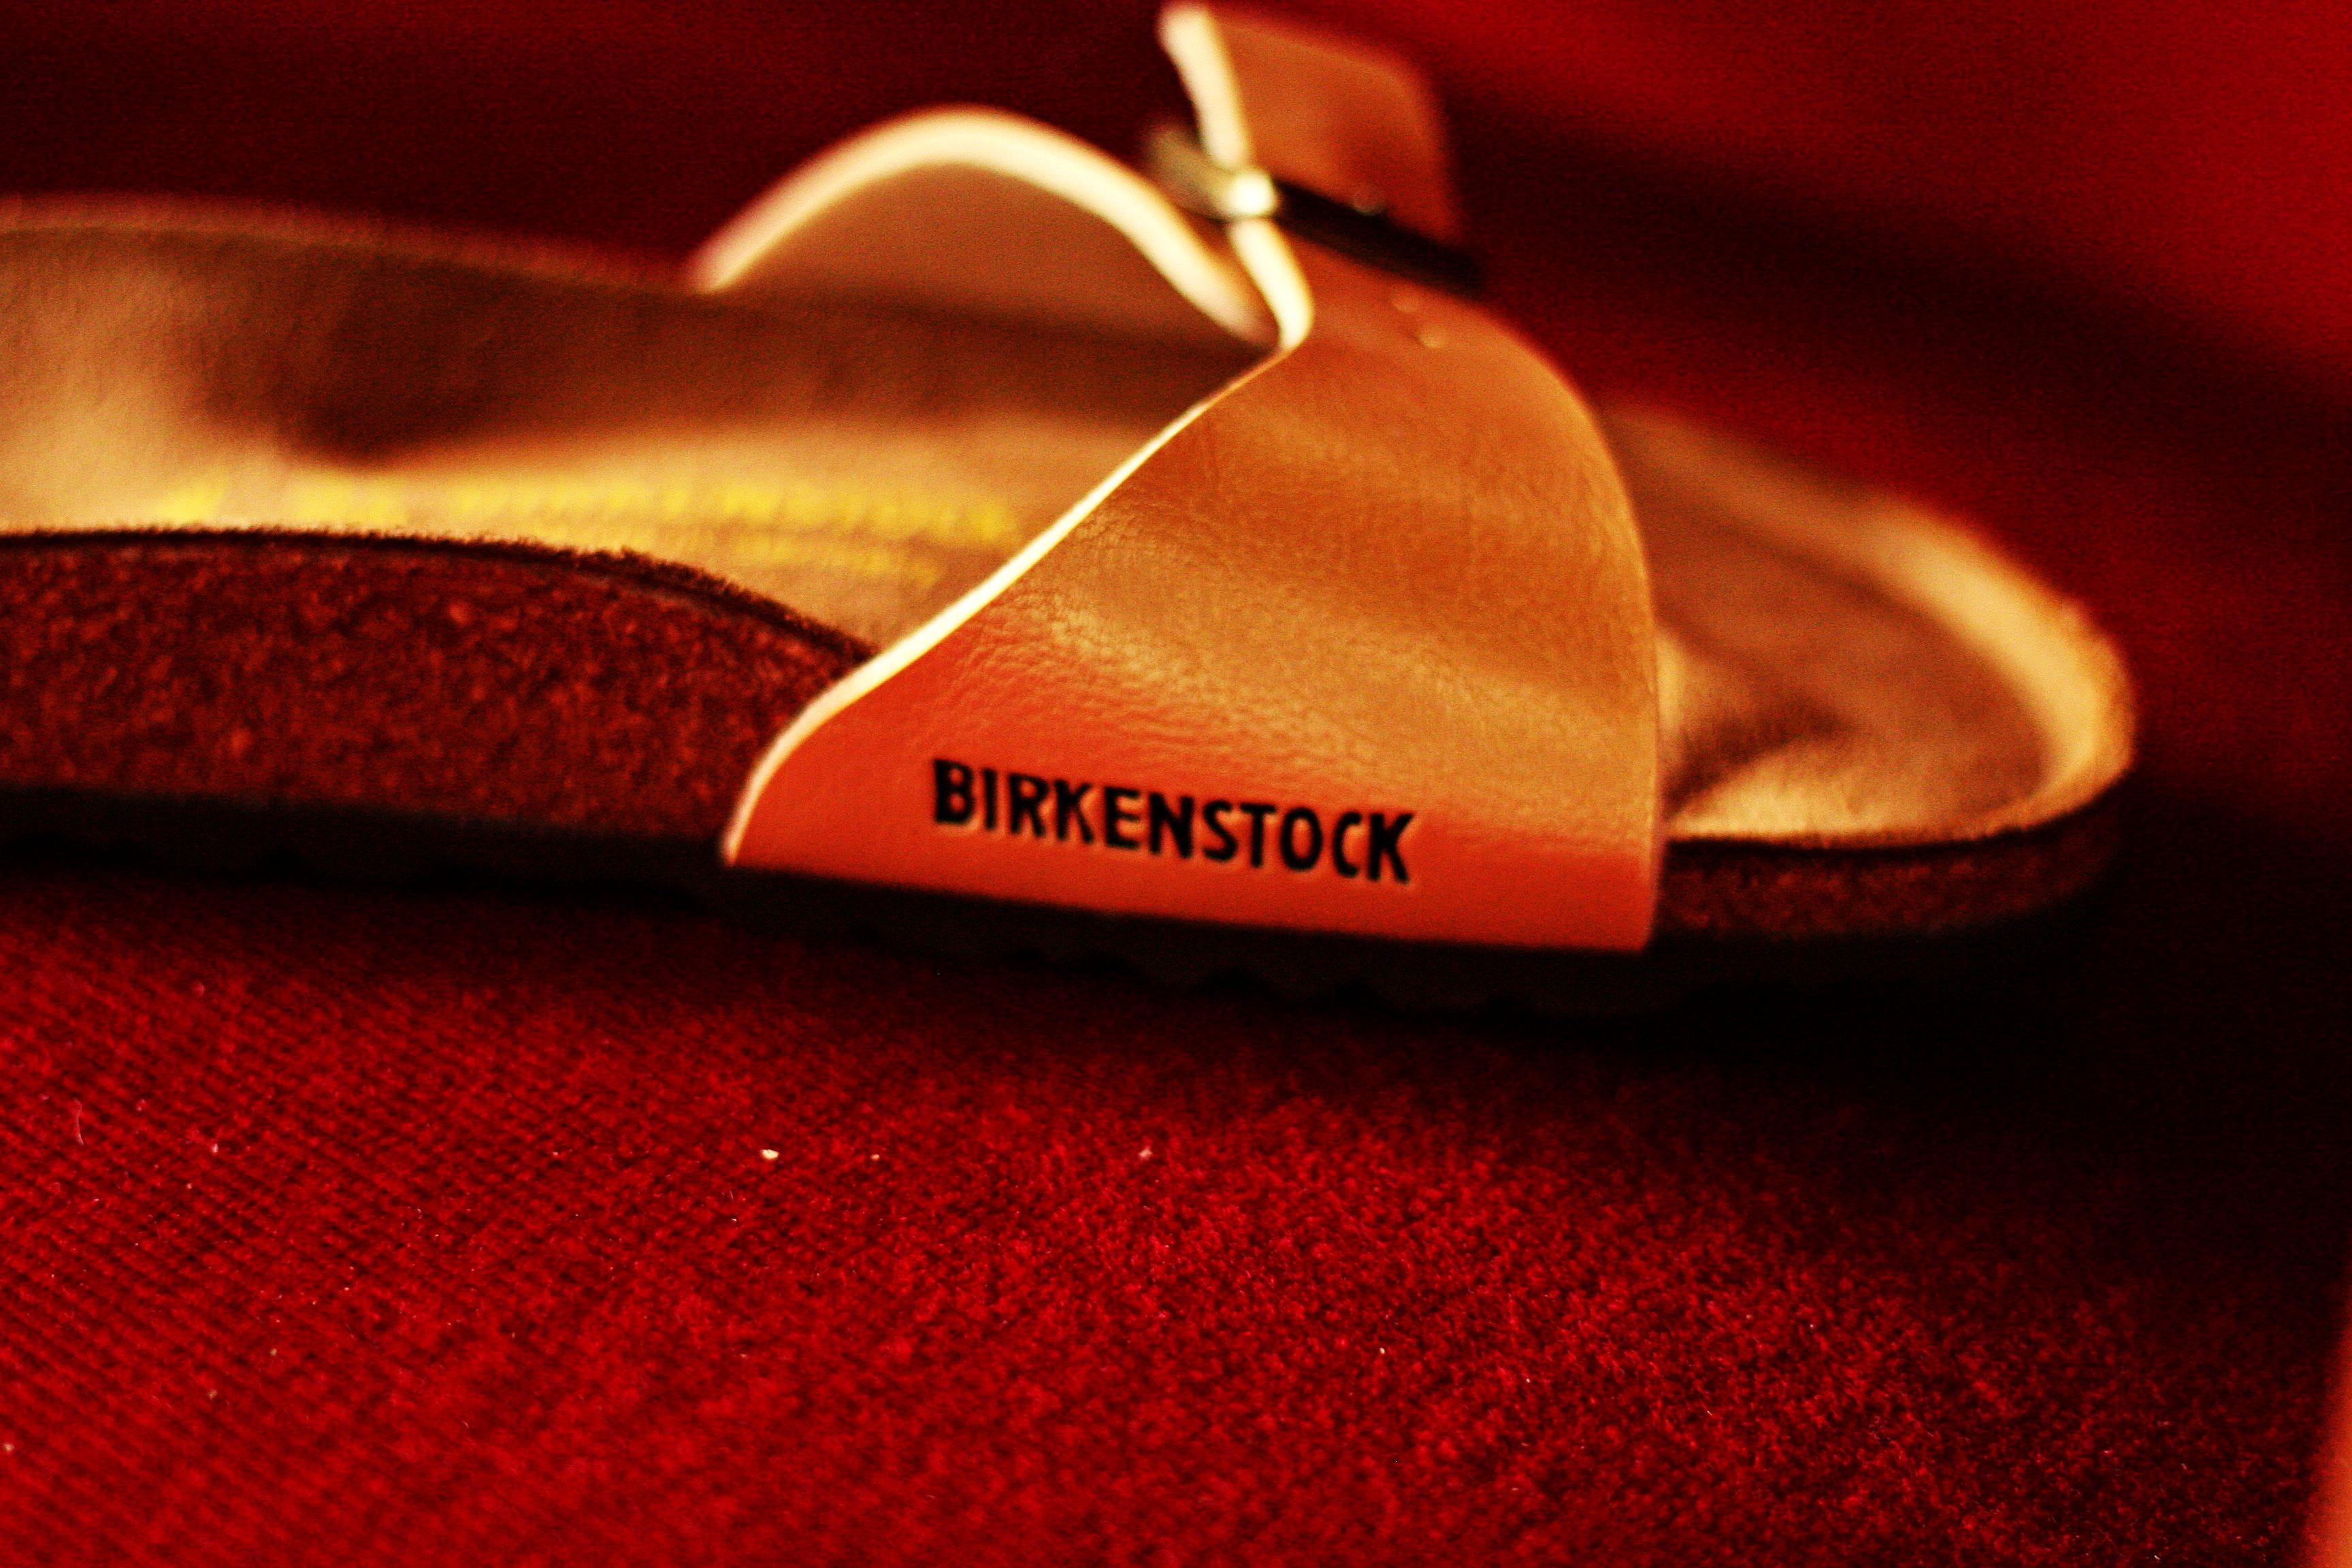 birkenstock-blog-mode-fanny-chaussures